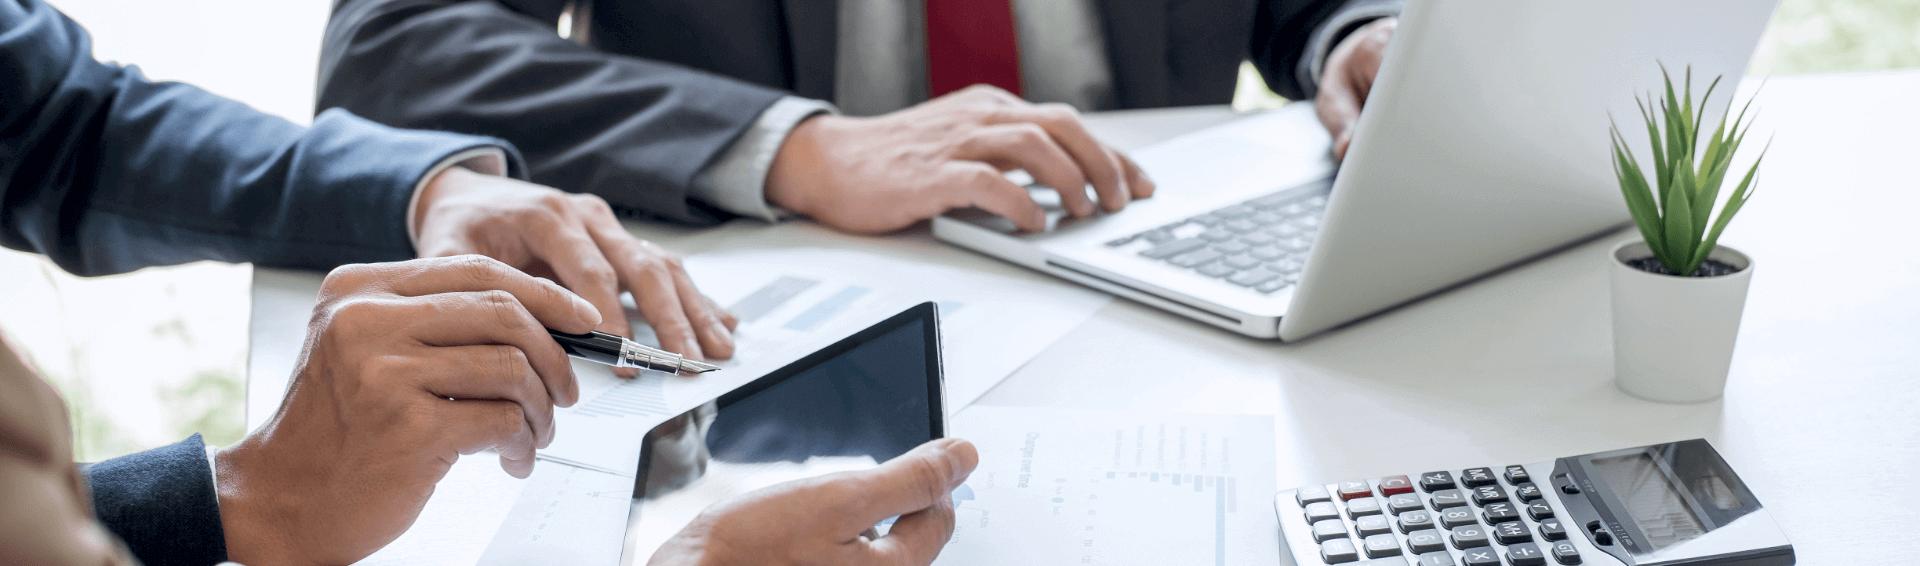 O guia completo sobre Banking as a Service e seus benefícios